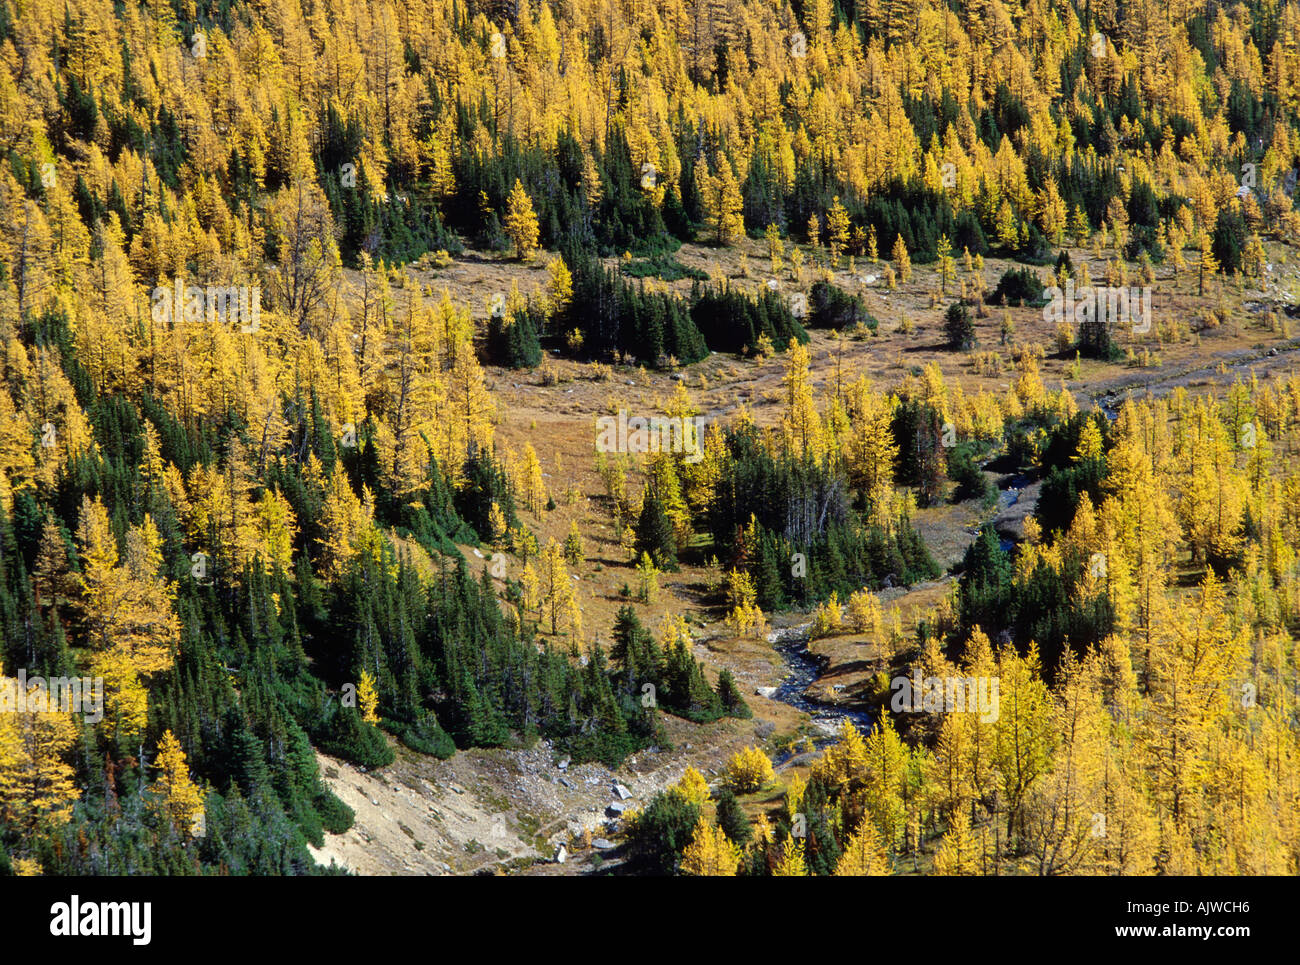 Taiga, subalpine larch in autumn foliage and englemann spruce, Larch Valley, Banff National Park, Alberta - Stock Image